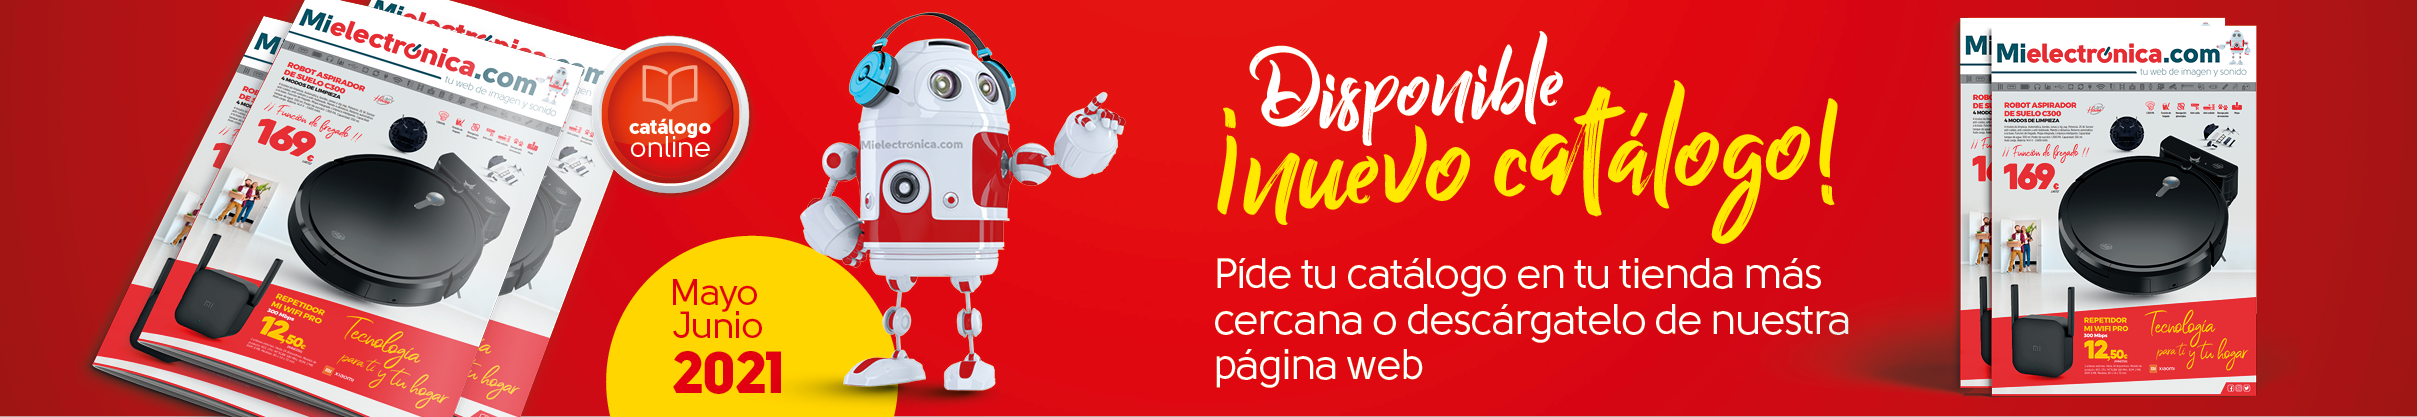 Banner Nuevo Catalogo.jpg